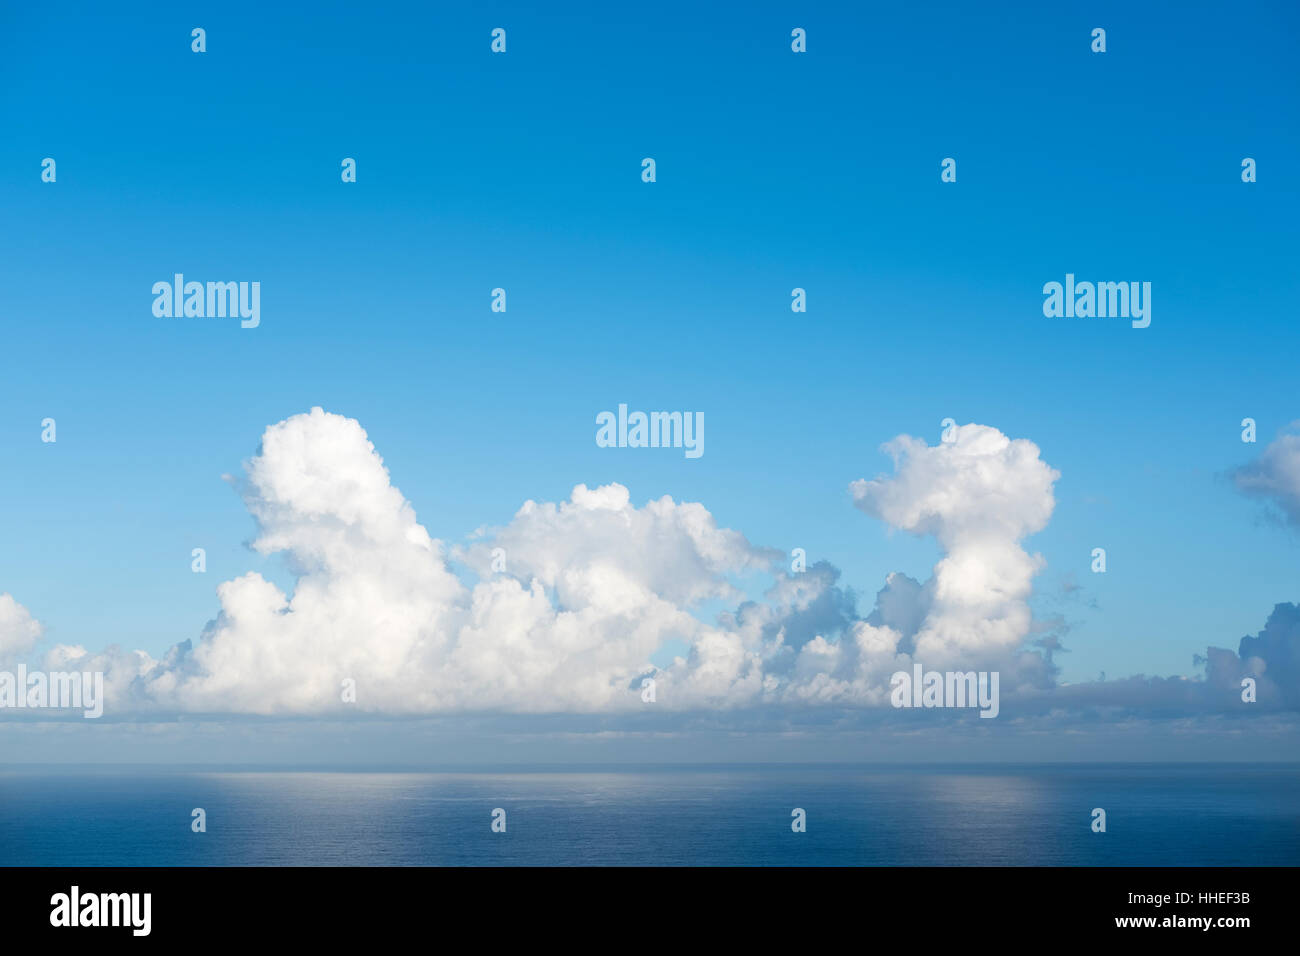 Cumulonimbus clouds above sea, Tenerife, Spain - Stock Image